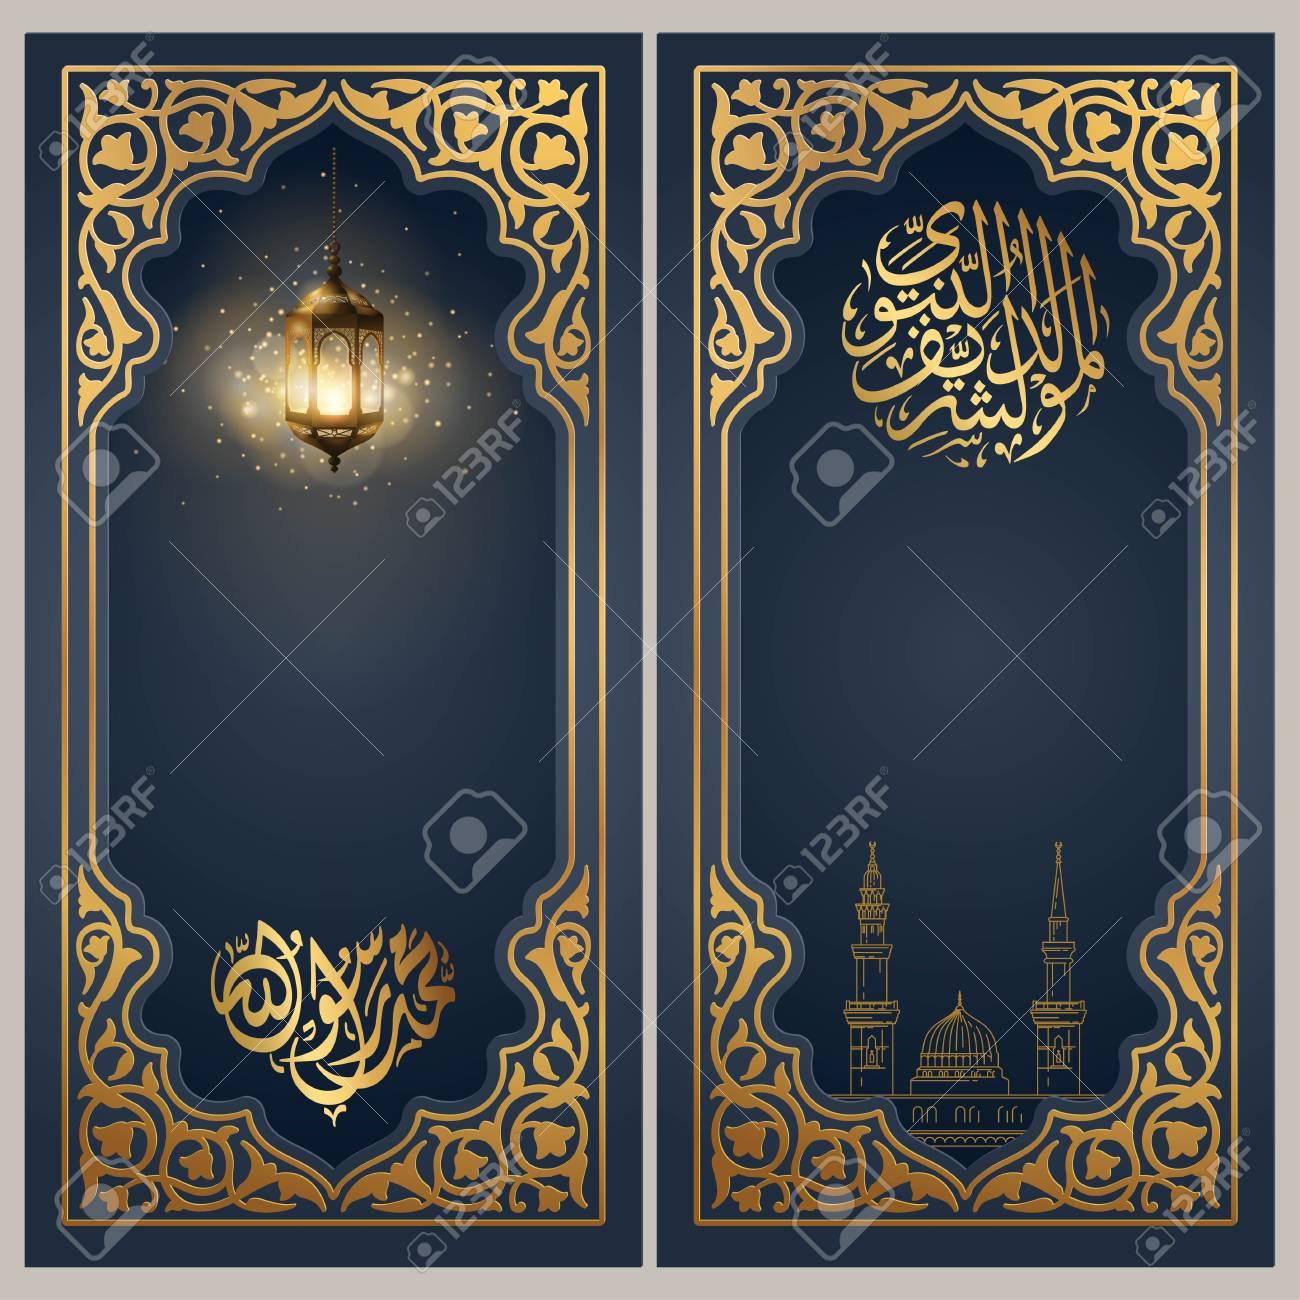 Mawlid Al Nabi Greeting Banner Background Template For Islamic